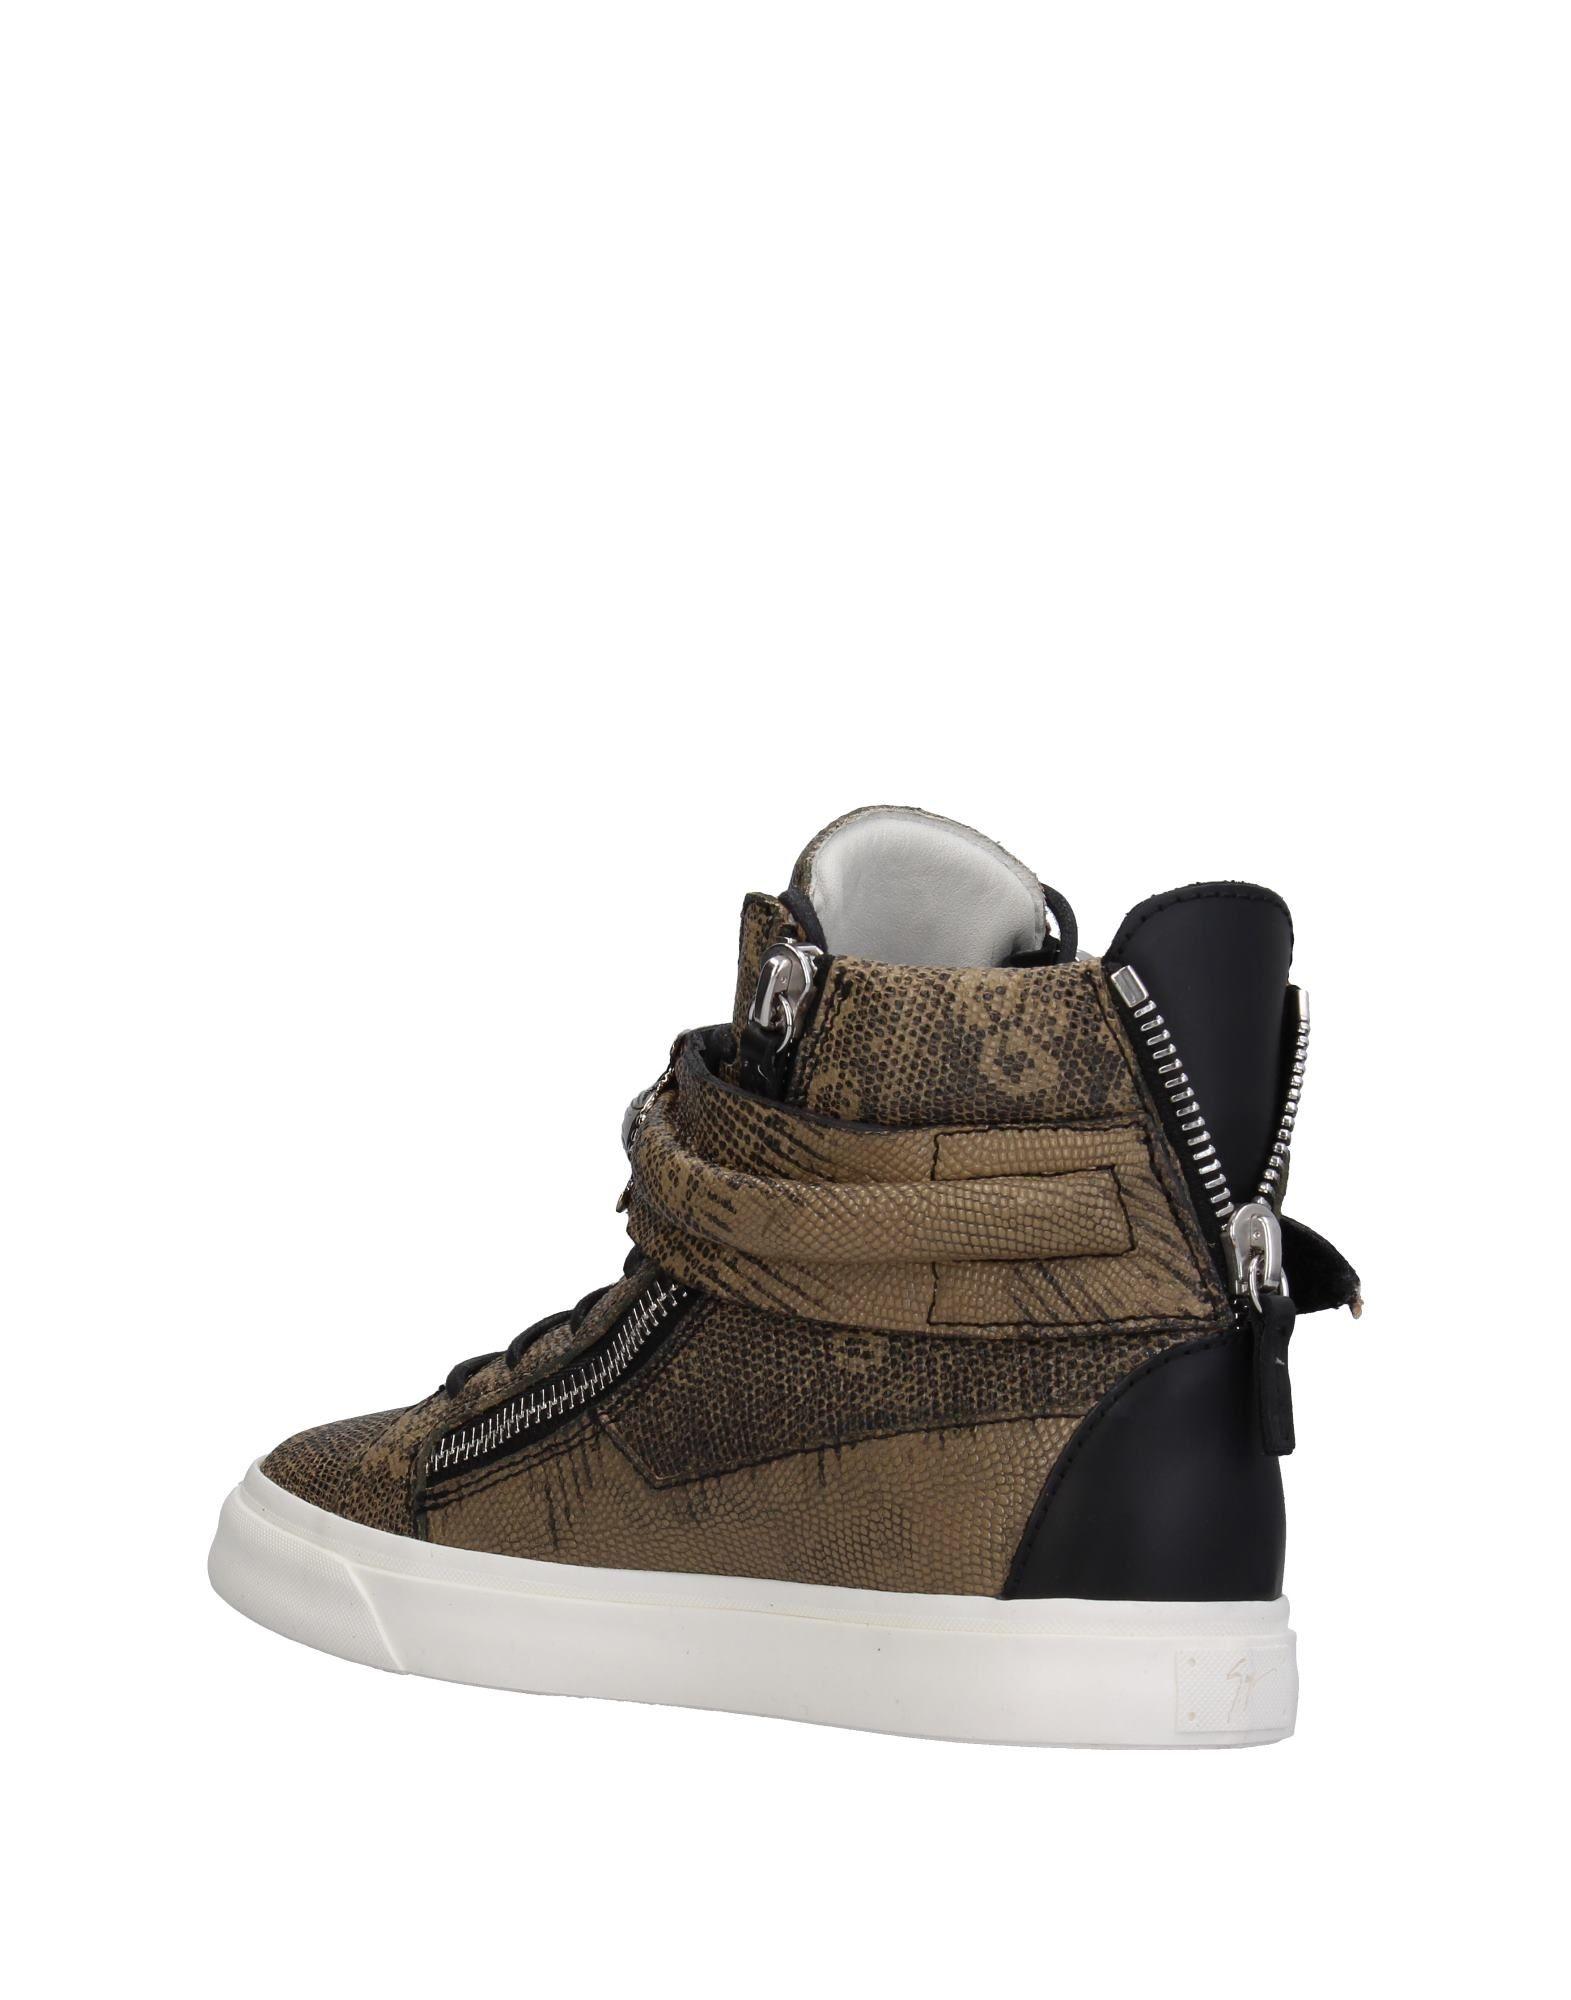 Giuseppe Zanotti Sneakers Sneakers Sneakers - Women Giuseppe Zanotti Sneakers online on  United Kingdom - 11387389AF e484fe